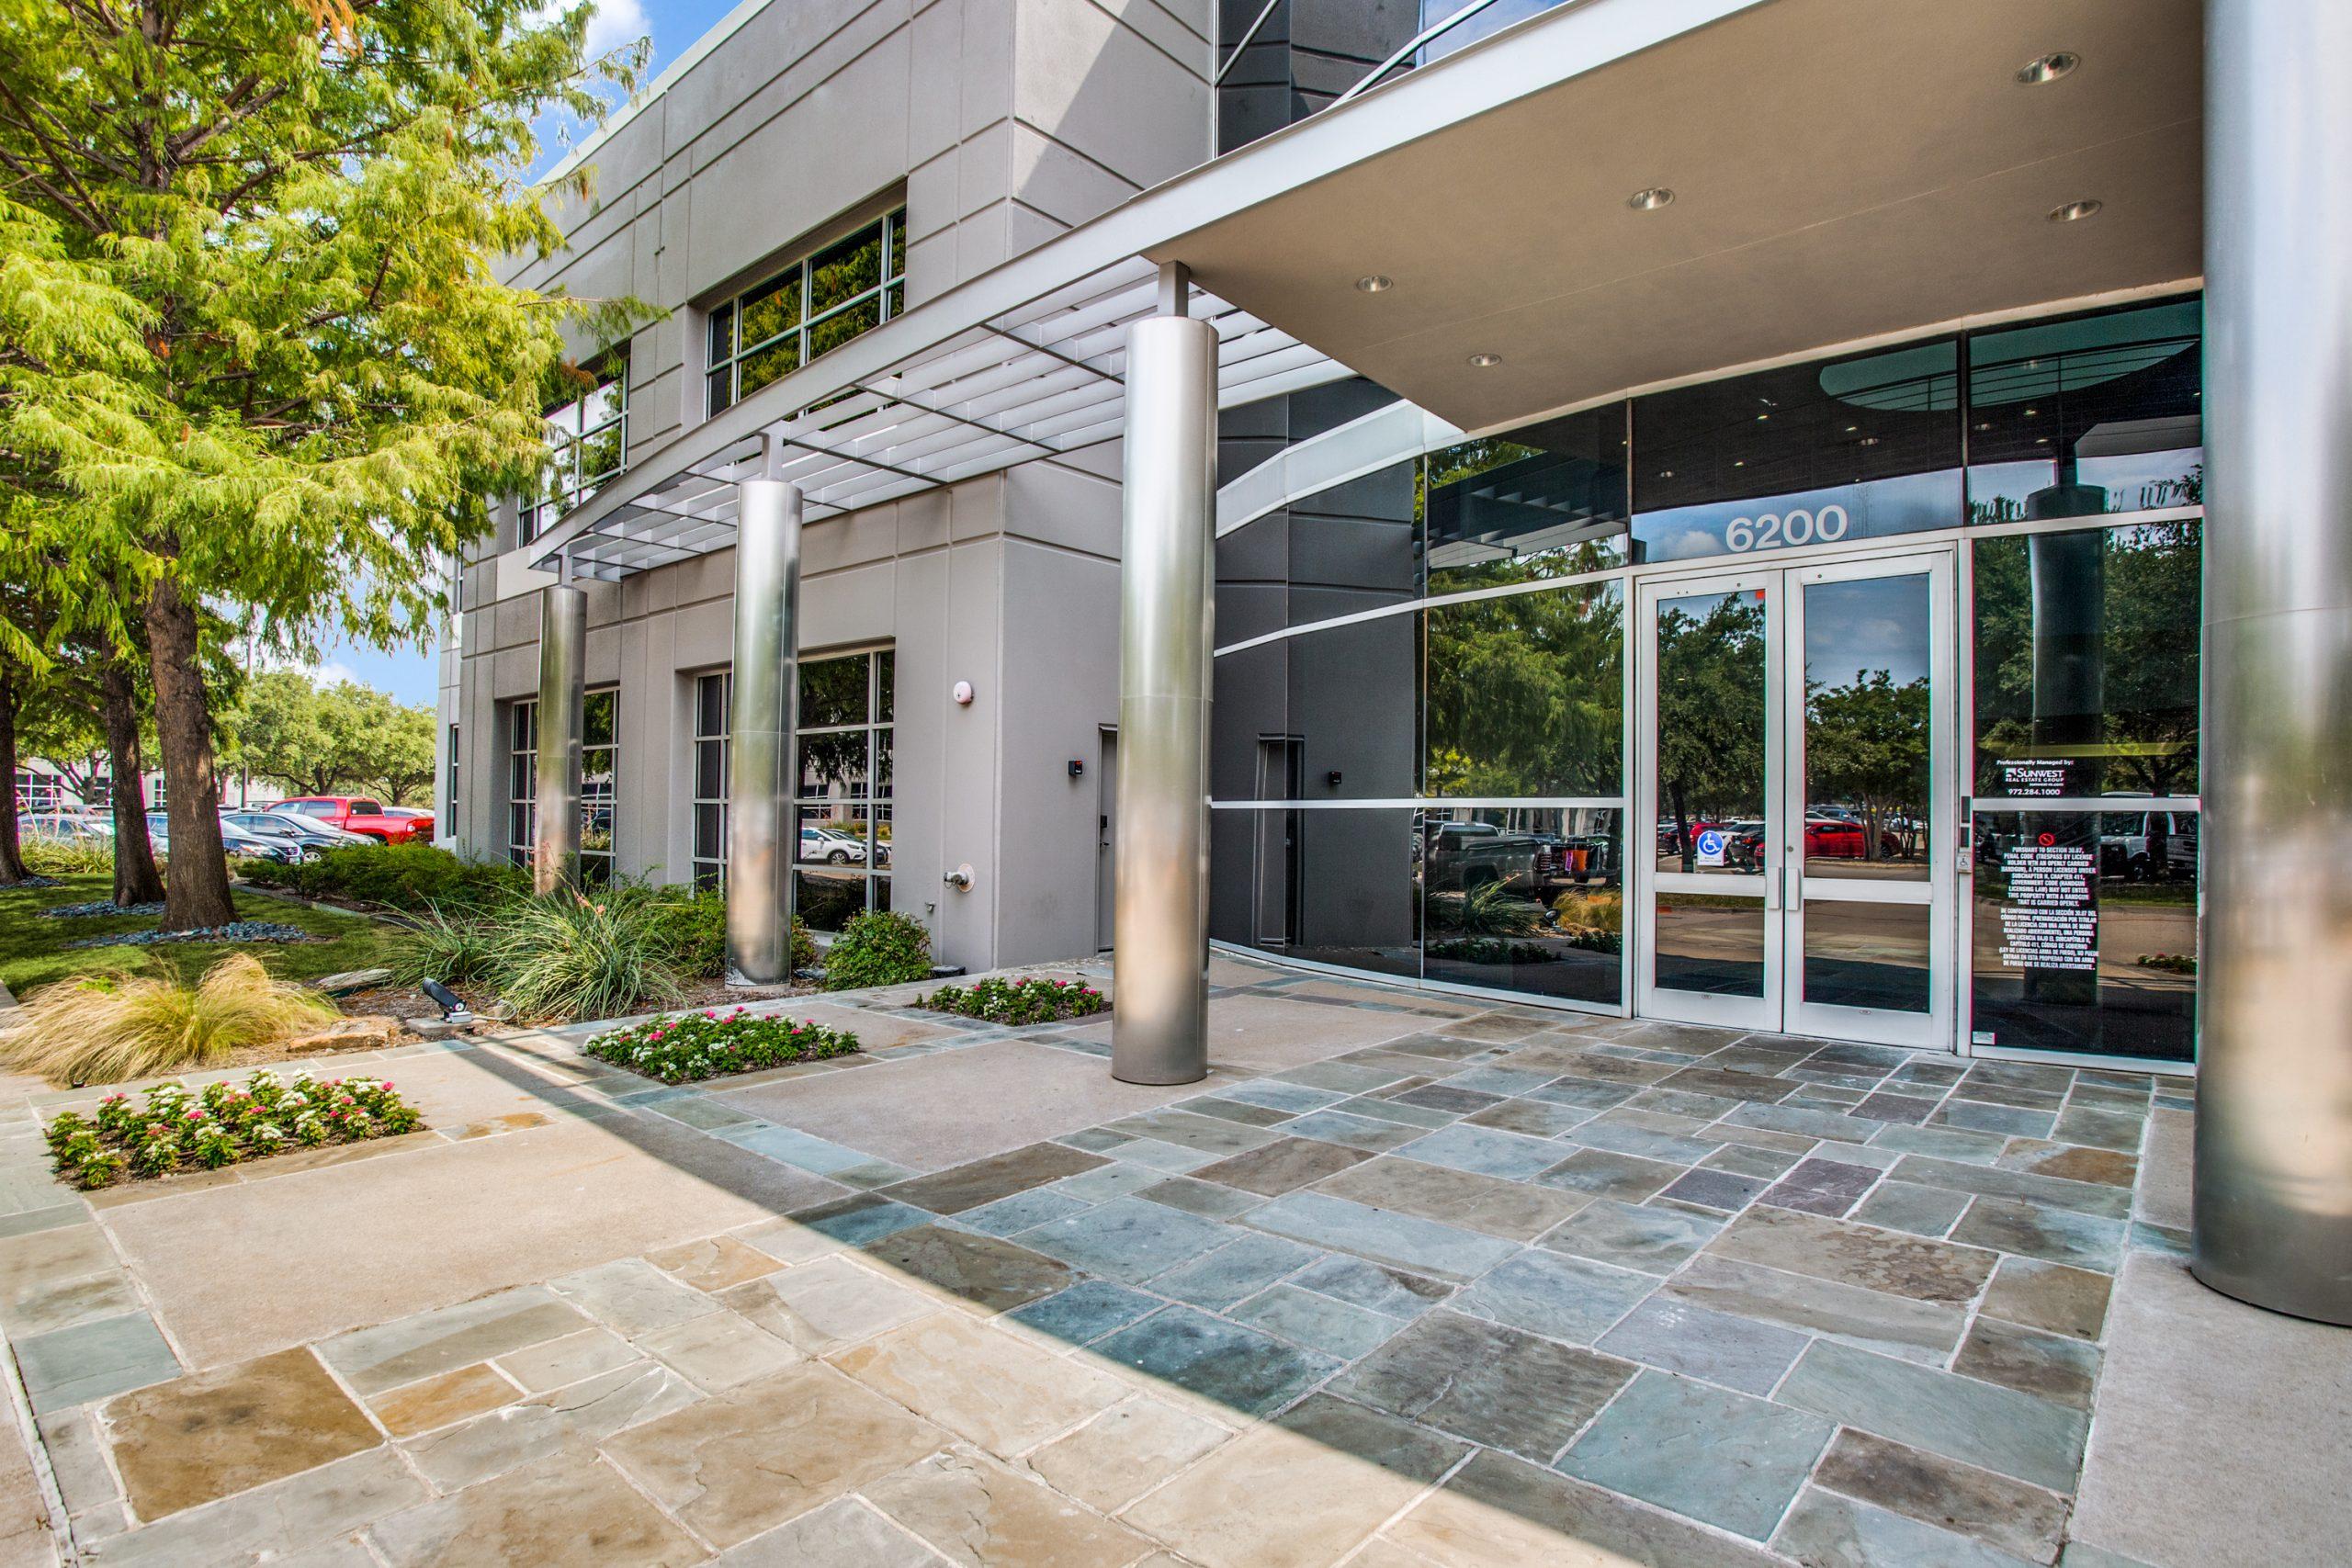 6200 Building Entrance